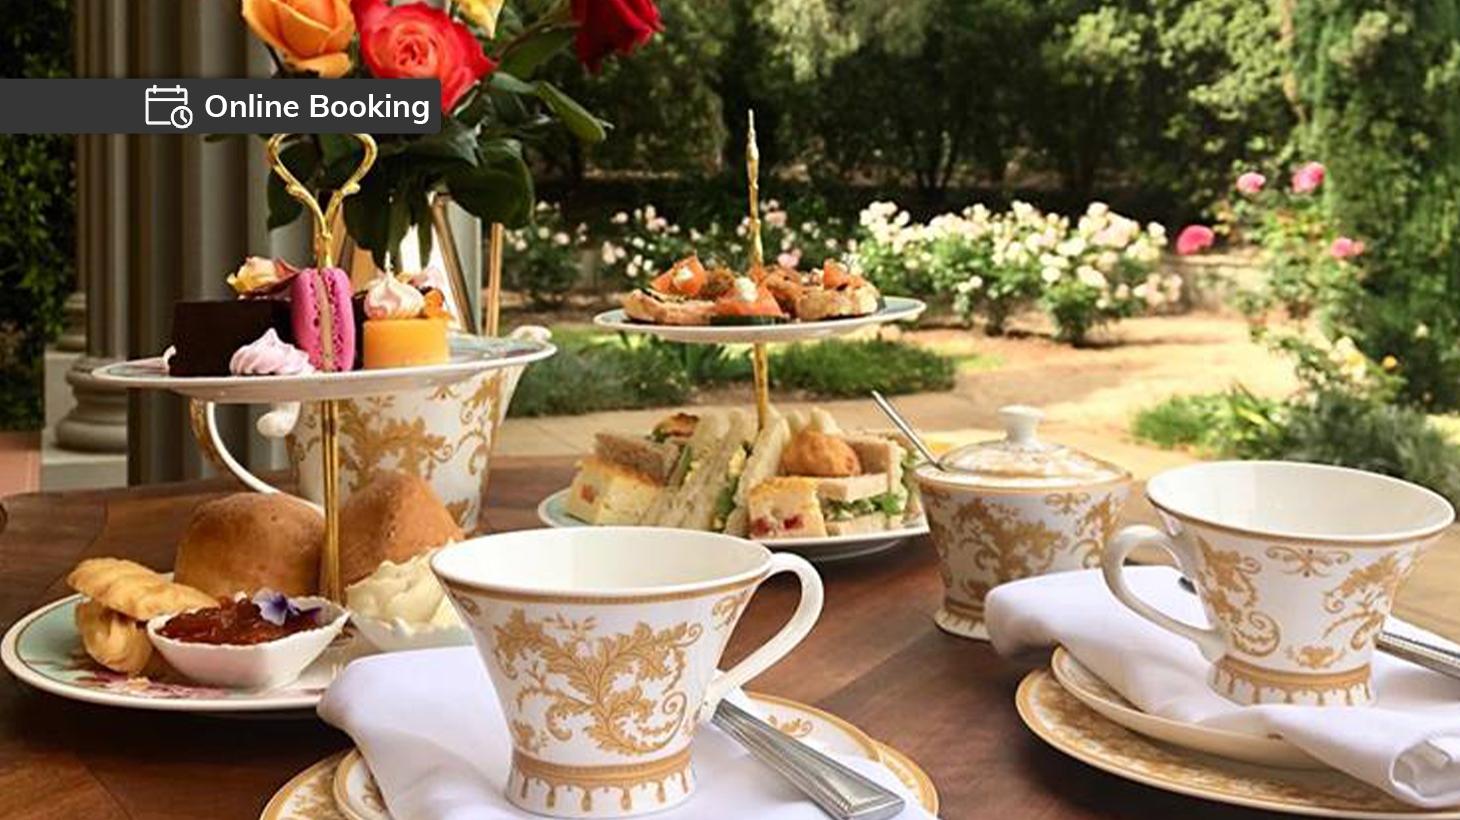 High tea set with assorted sweet and savoury treats